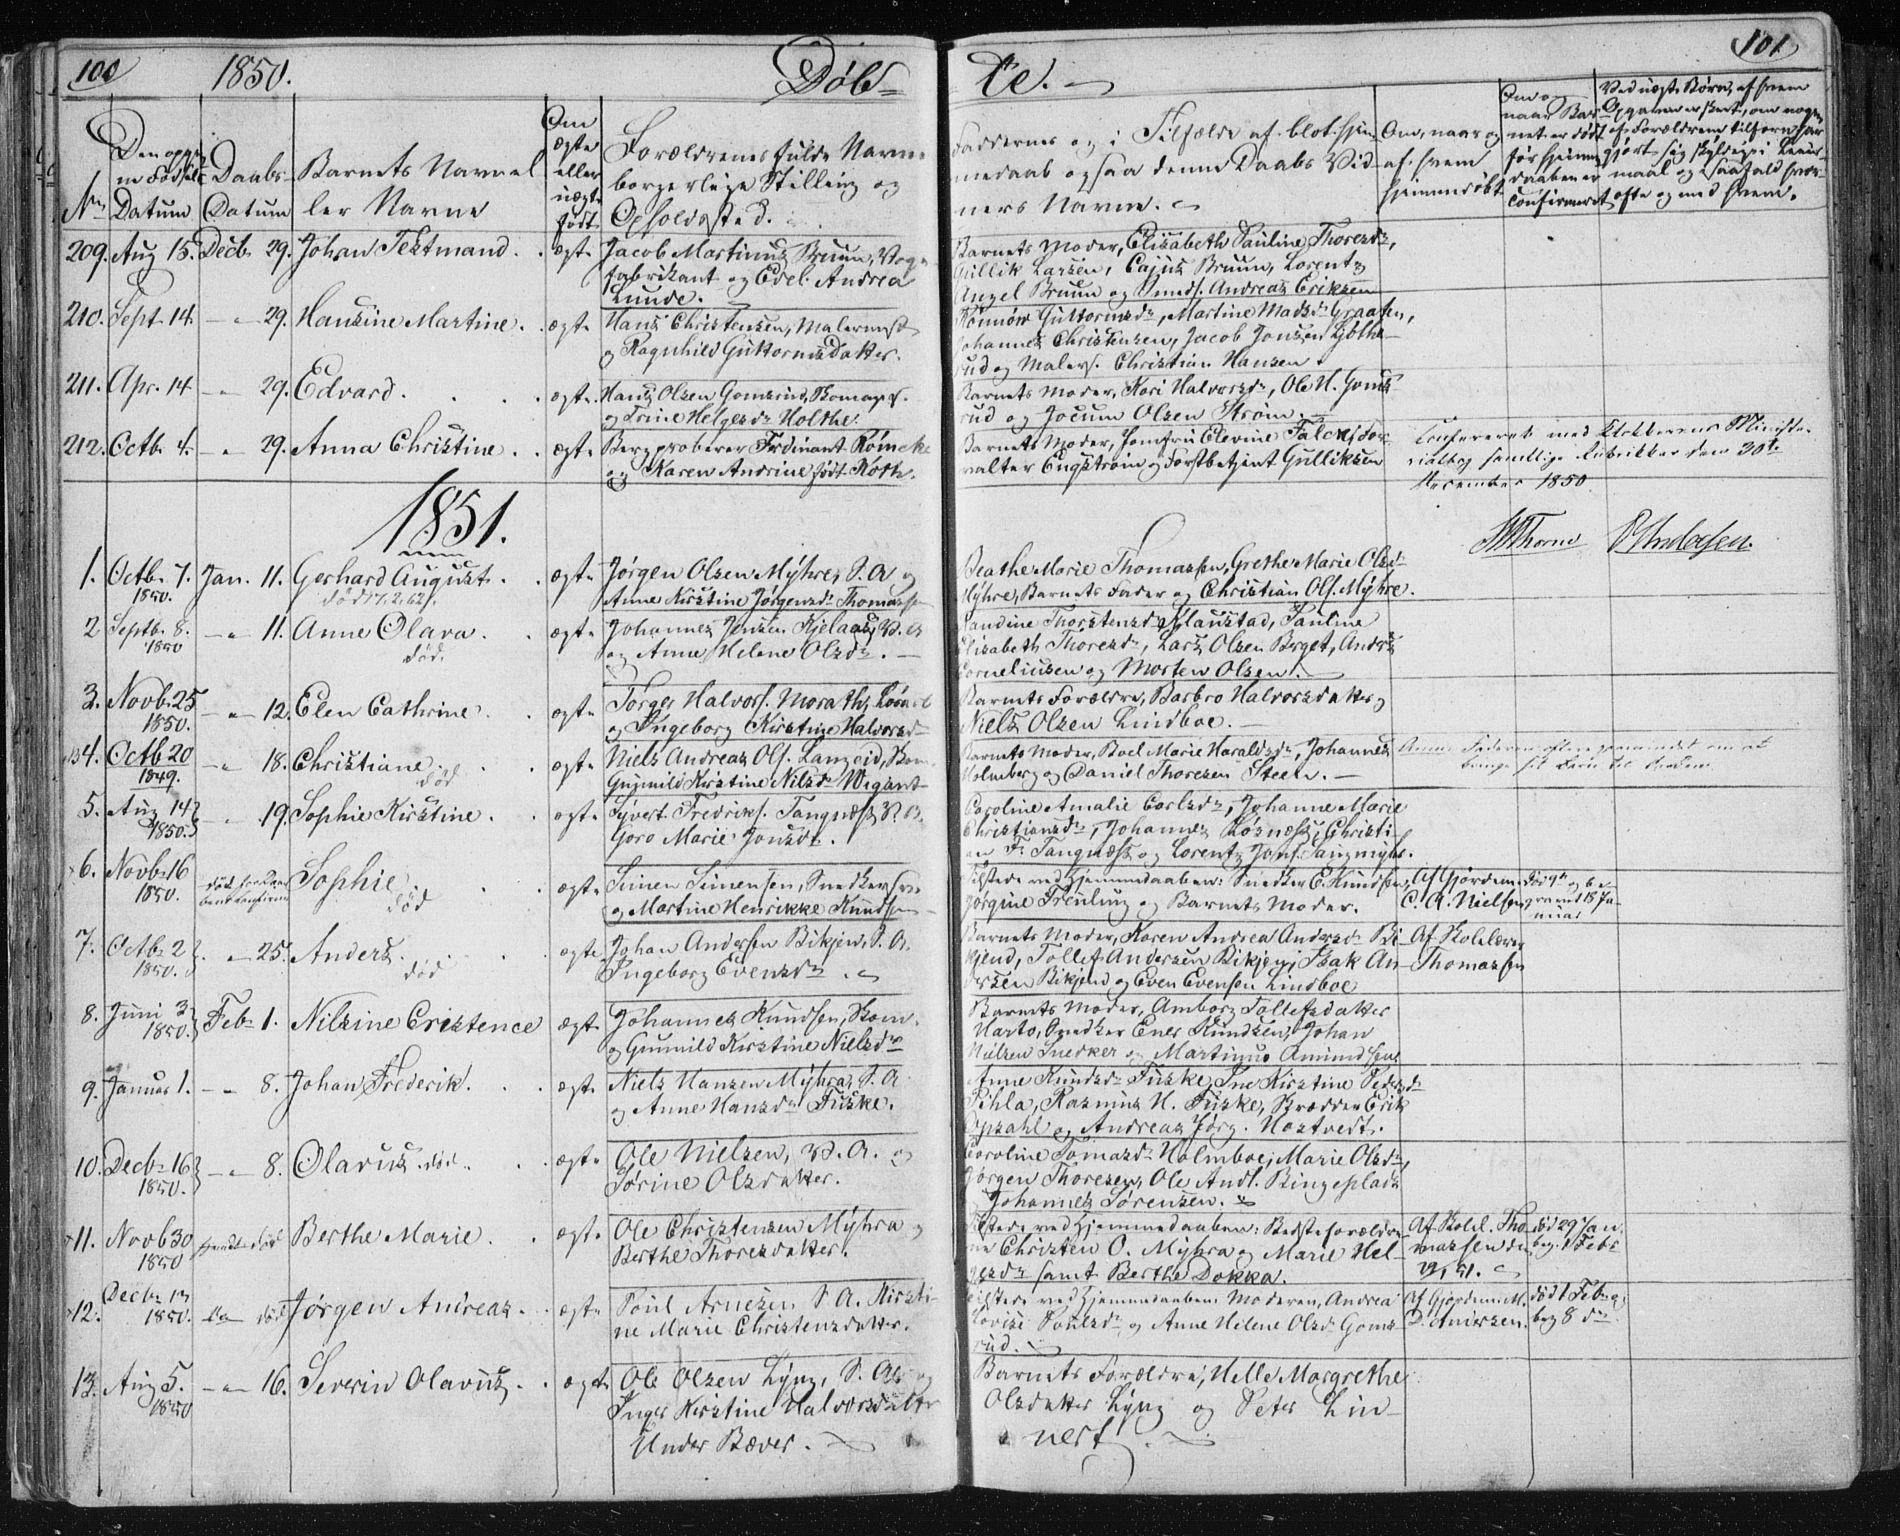 SAKO, Kongsberg kirkebøker, F/Fa/L0009: Parish register (official) no. I 9, 1839-1858, p. 100-101